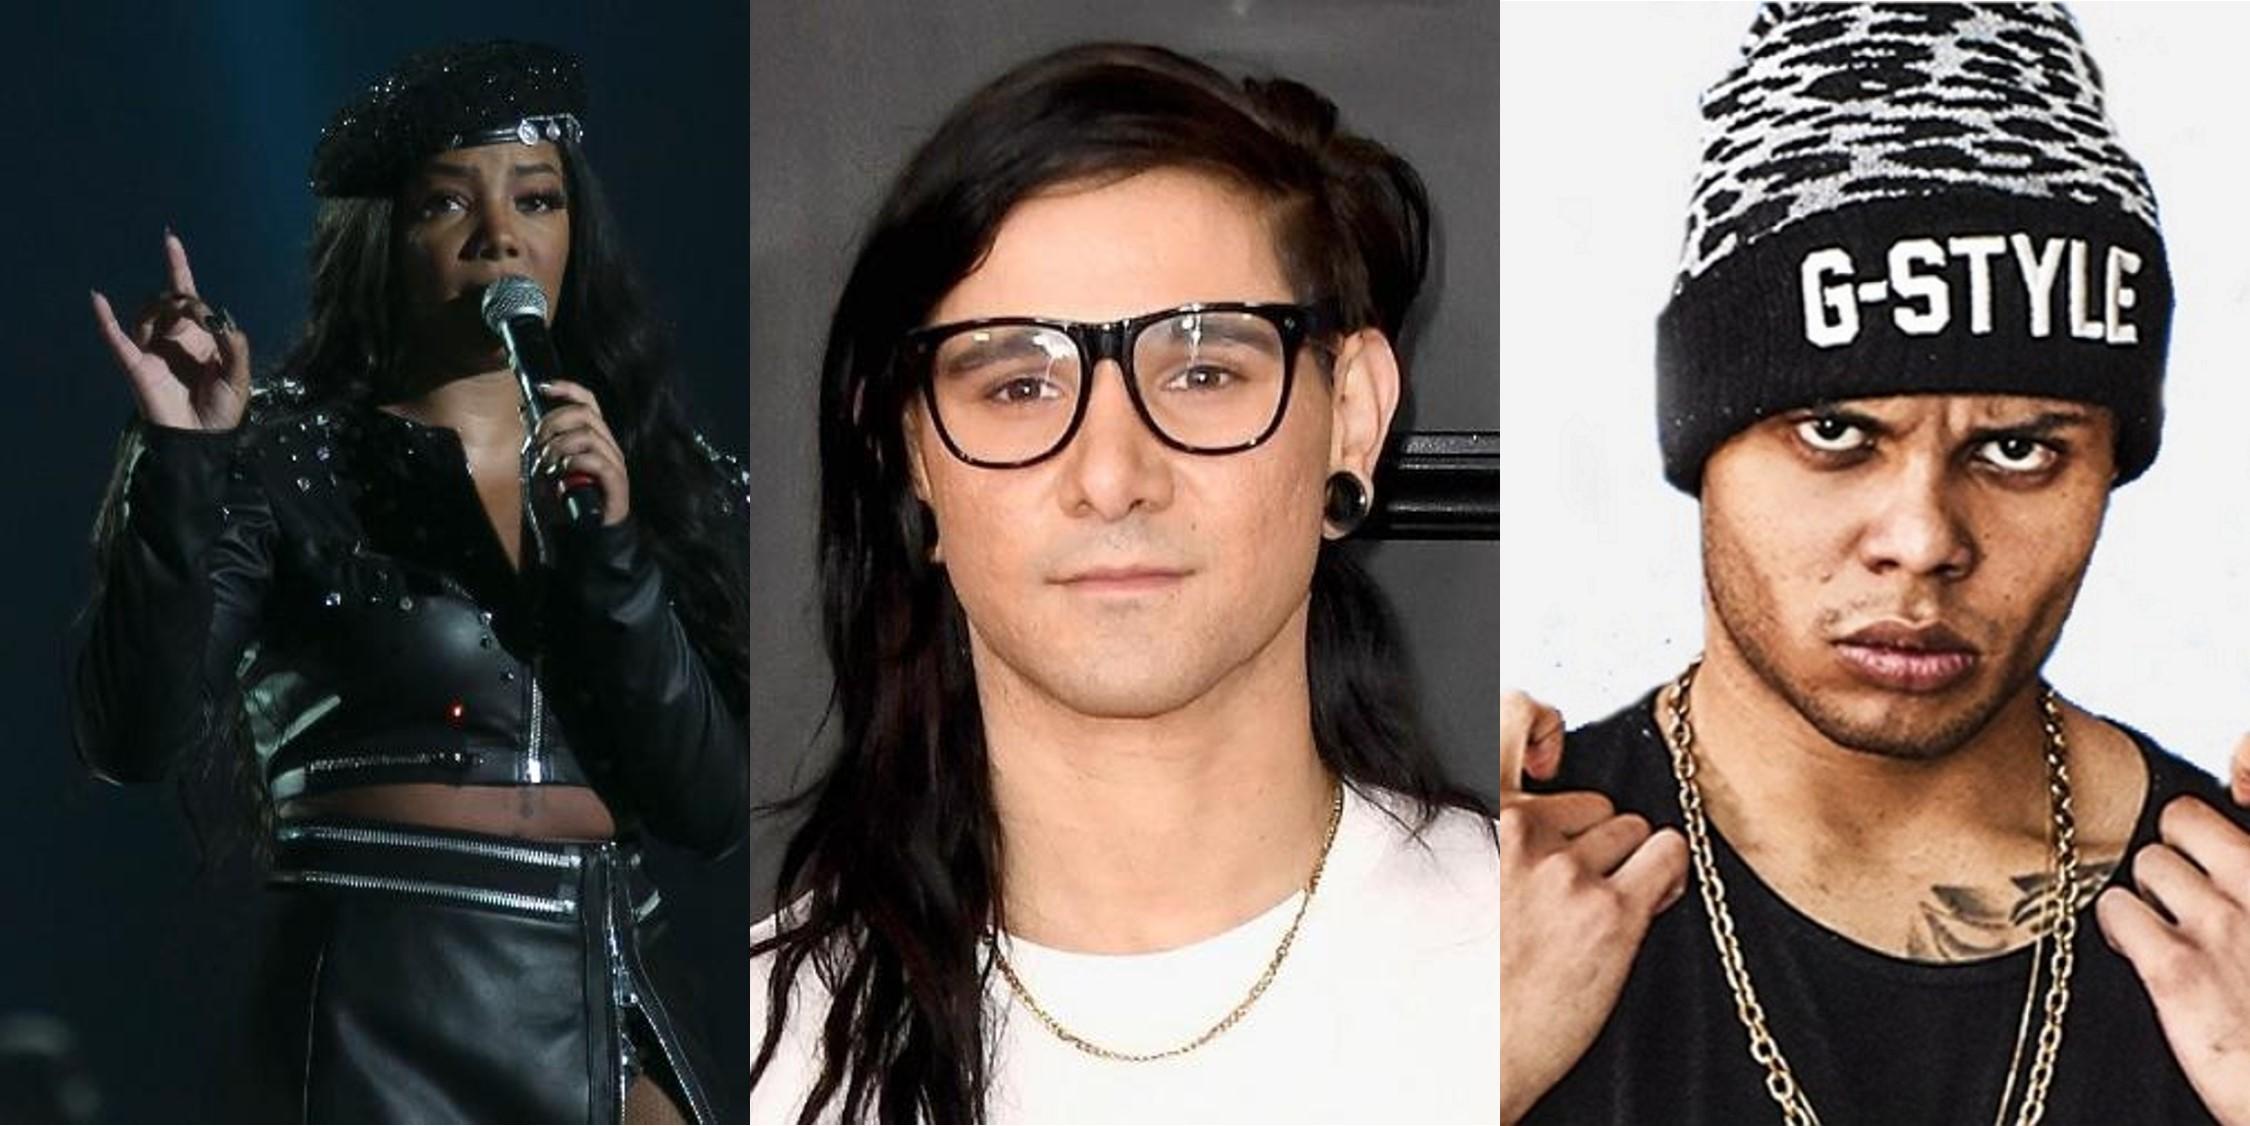 Skrillex, TroyBoi & MC Lan Join Ty Dolla $ign and Ludmilla